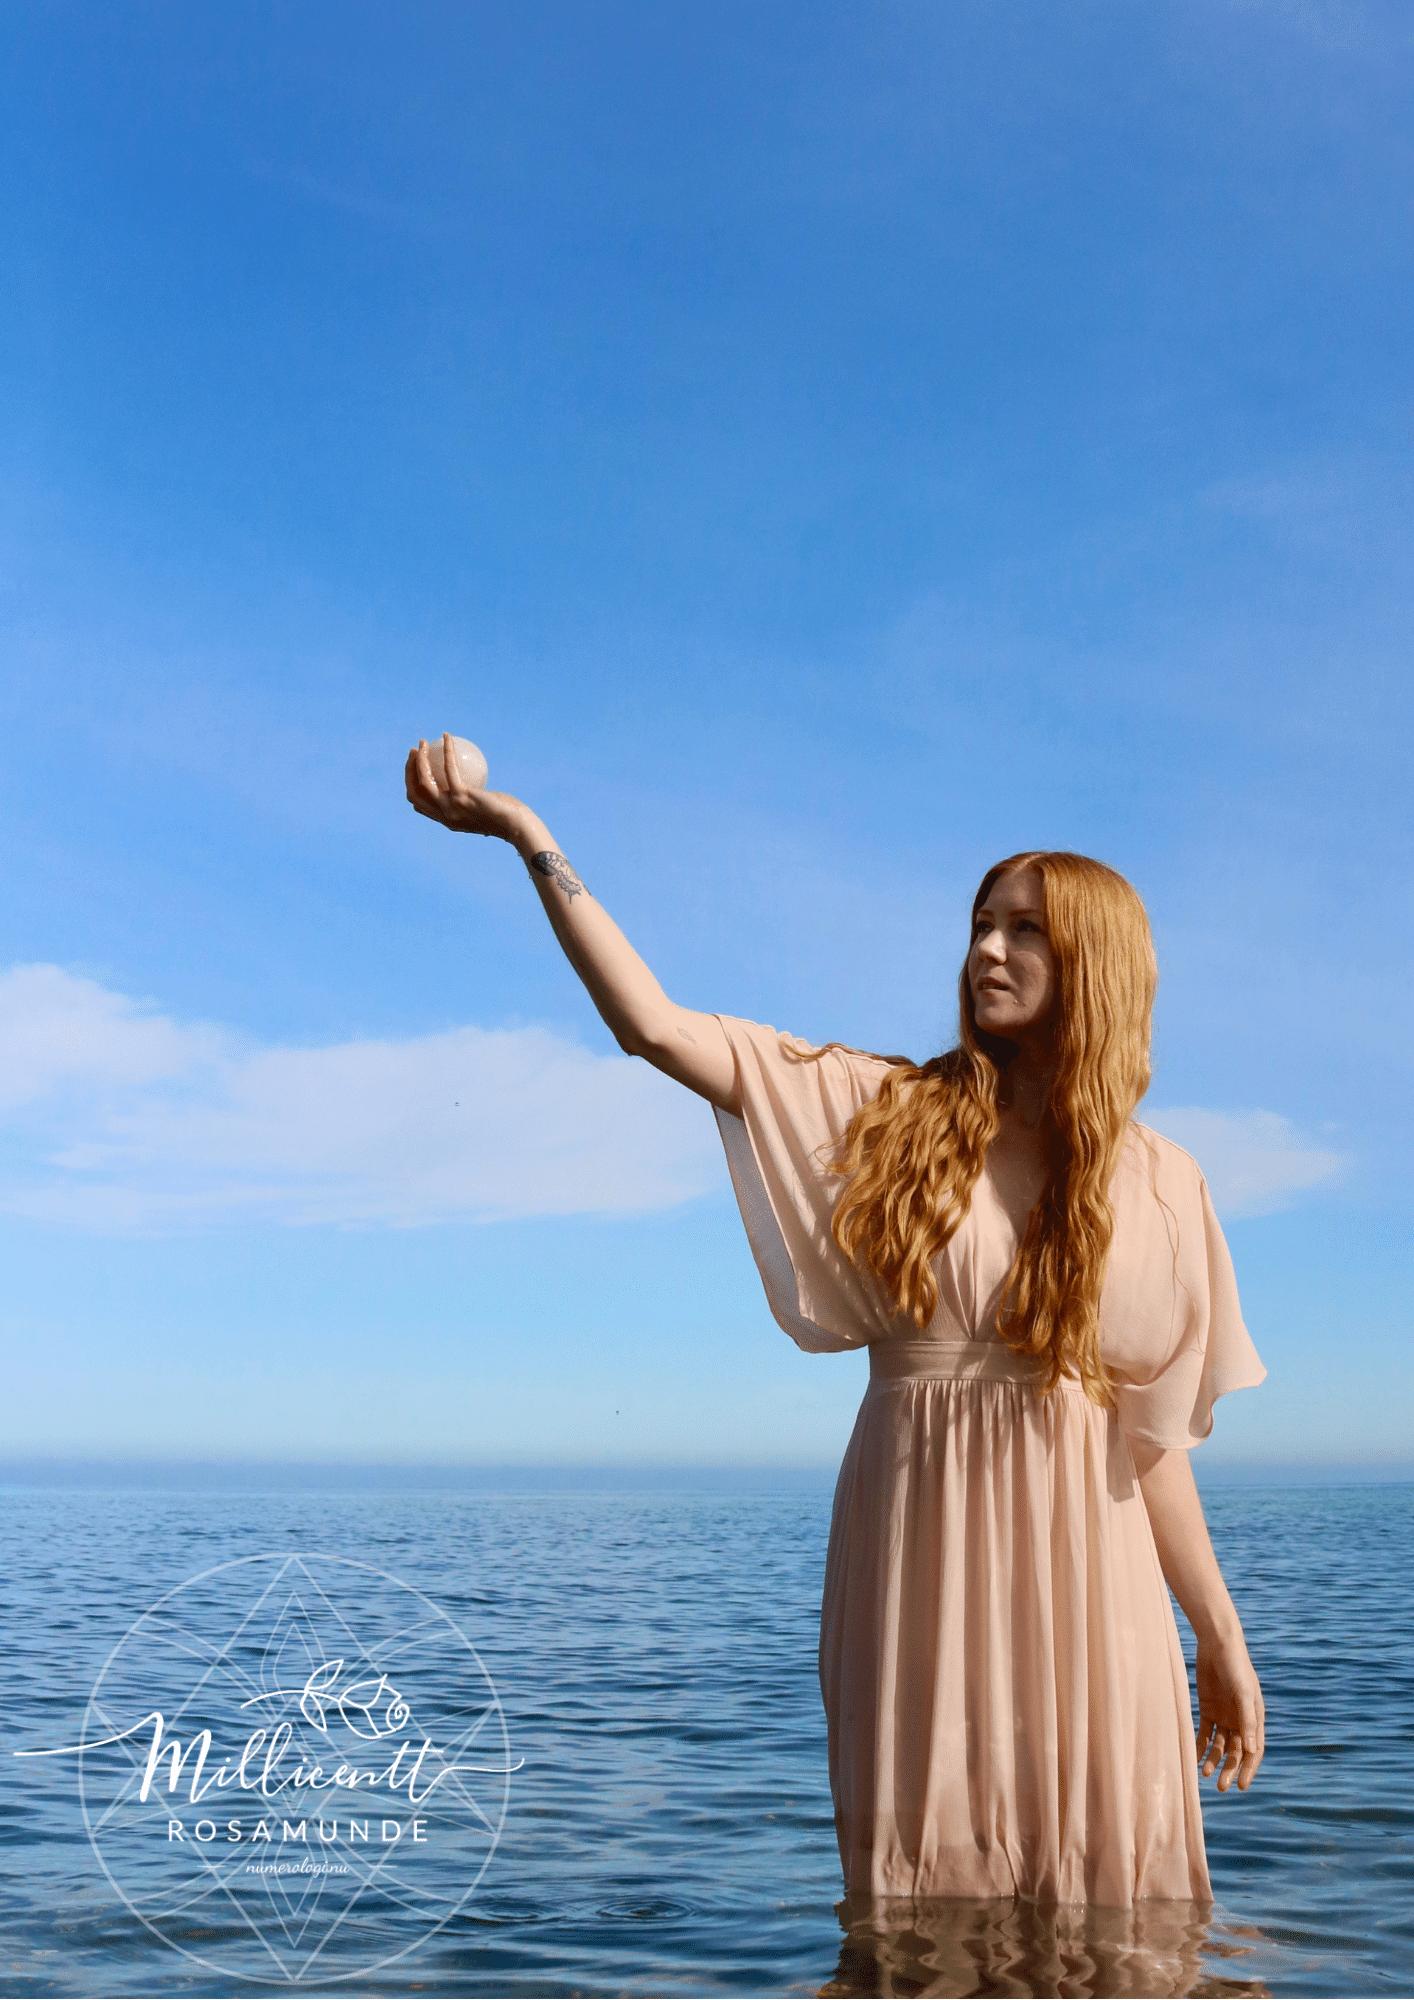 Det guddommelige feminine og maskuline - Klassisk Numerolog Millicentt Rosamunde